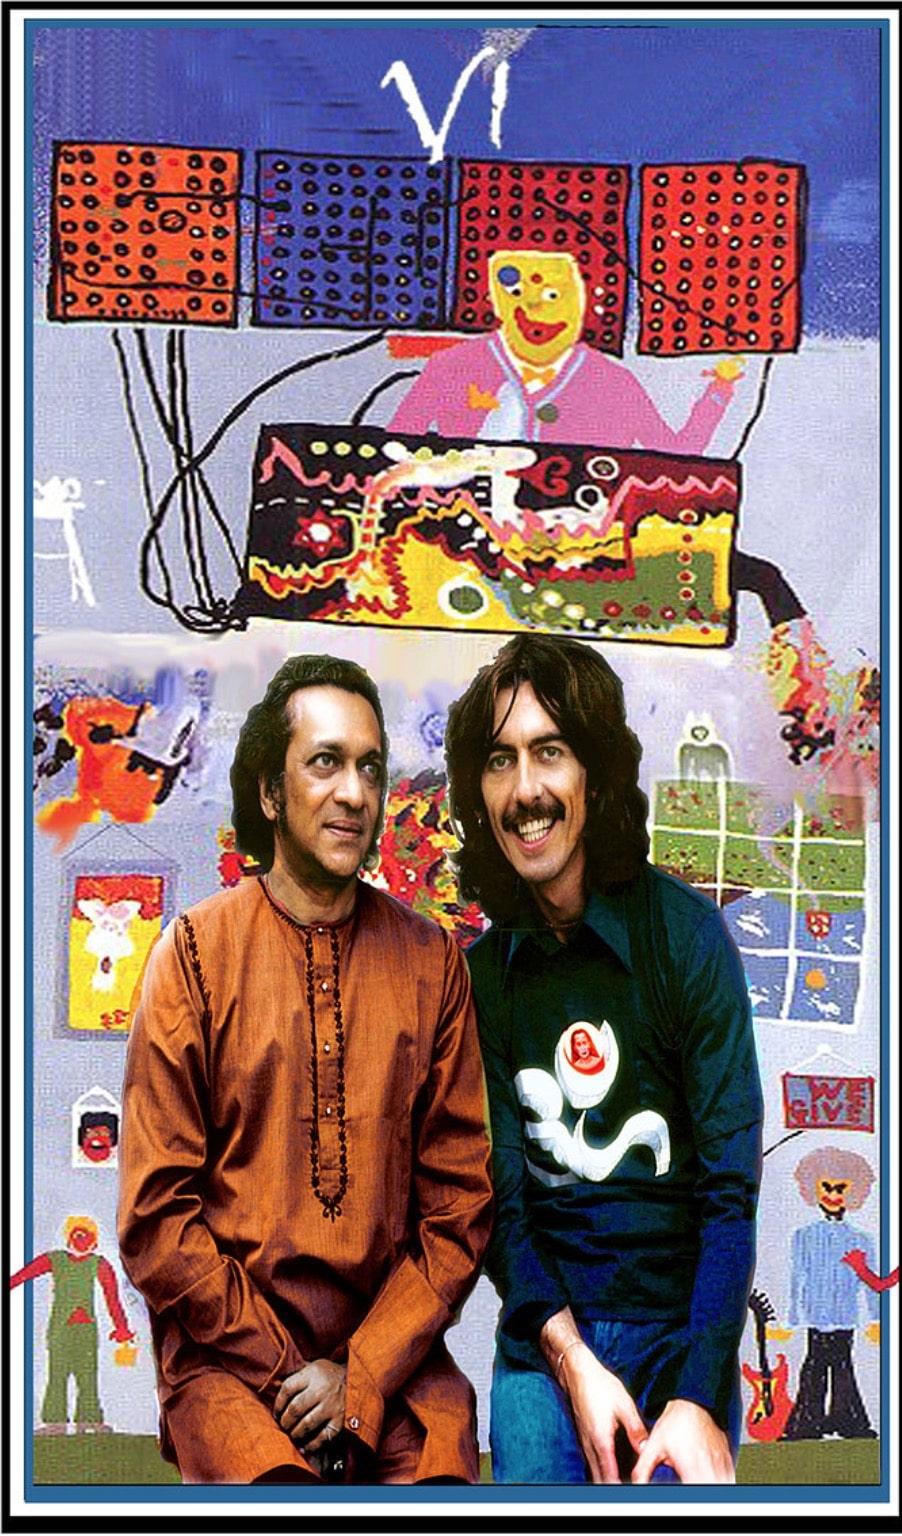 Tarot Decks Based on The Beatles & Bowie